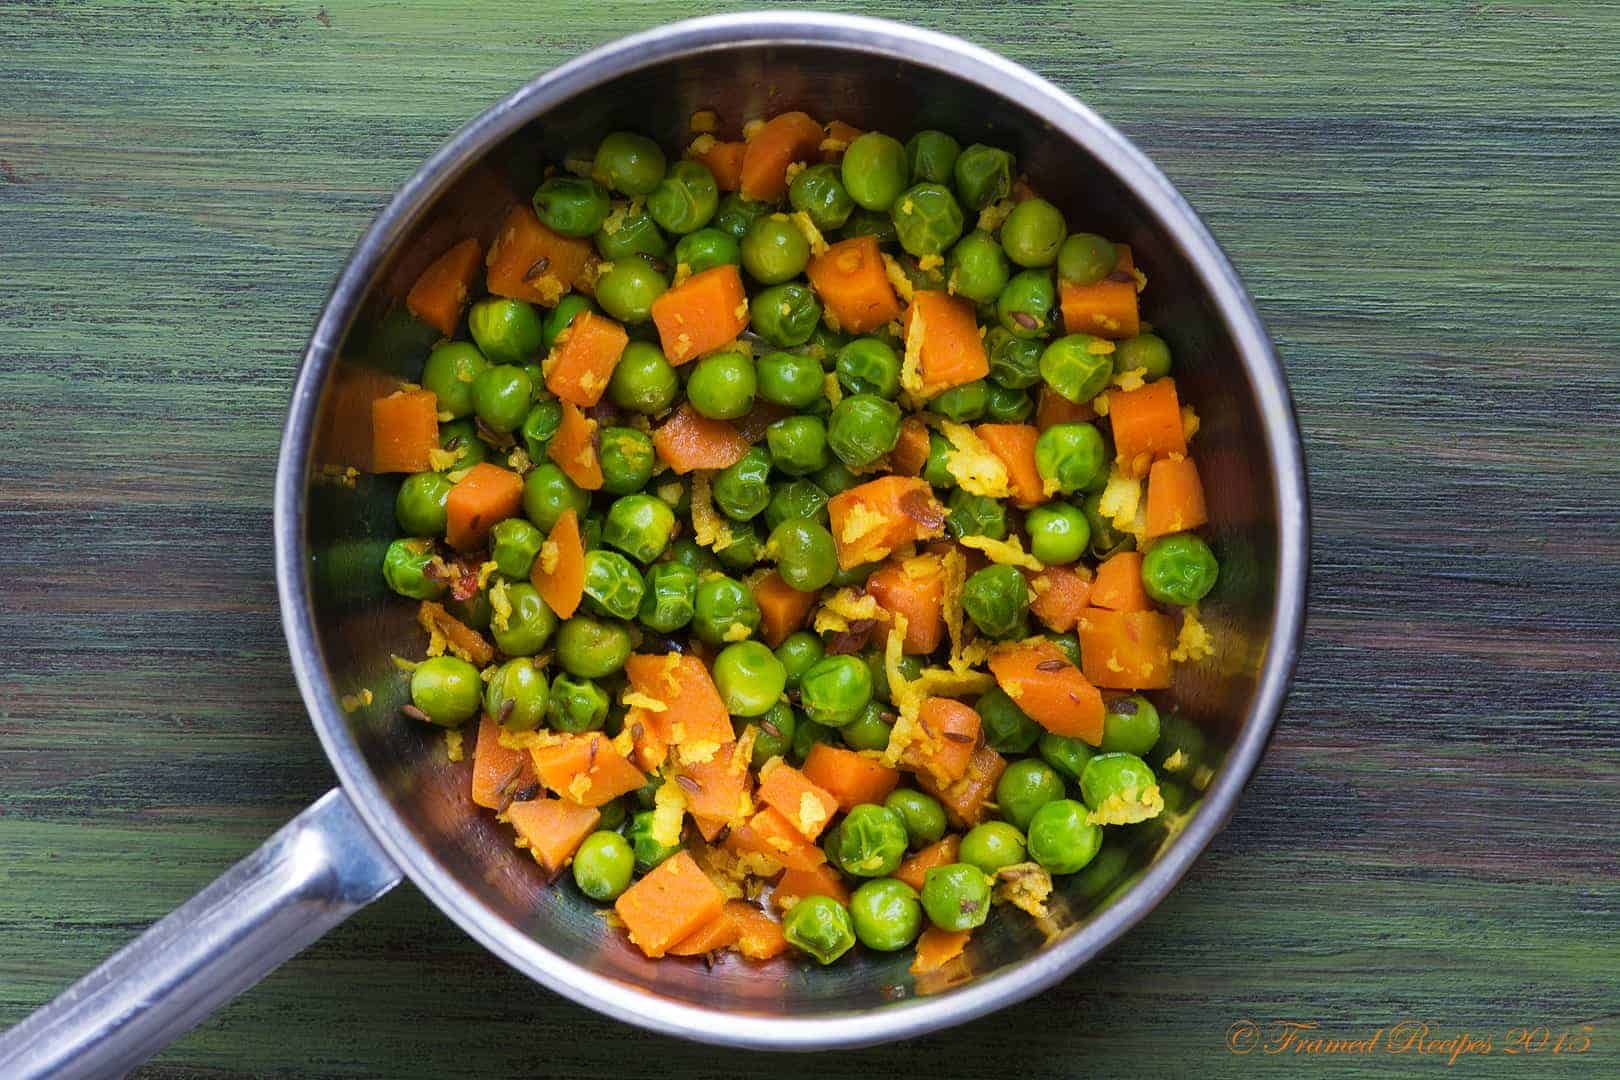 DSC_8173_Carrot_Peas_Stir_Fry_02